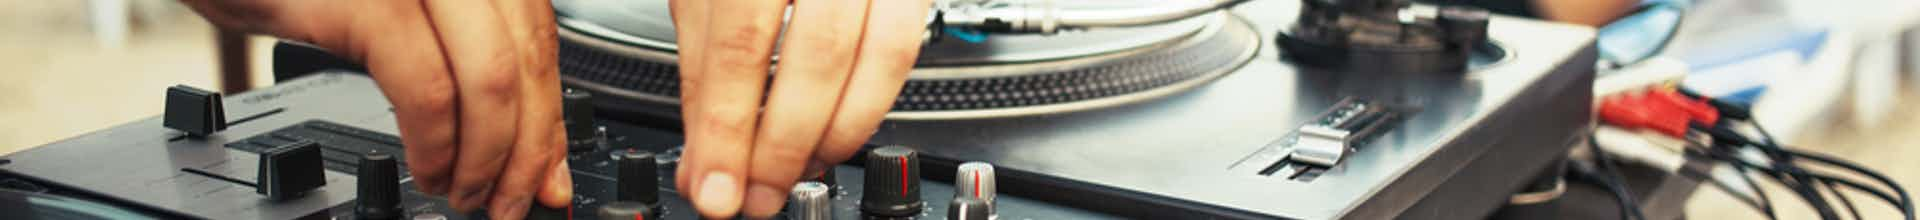 dj-mixer-strandparty-buchen